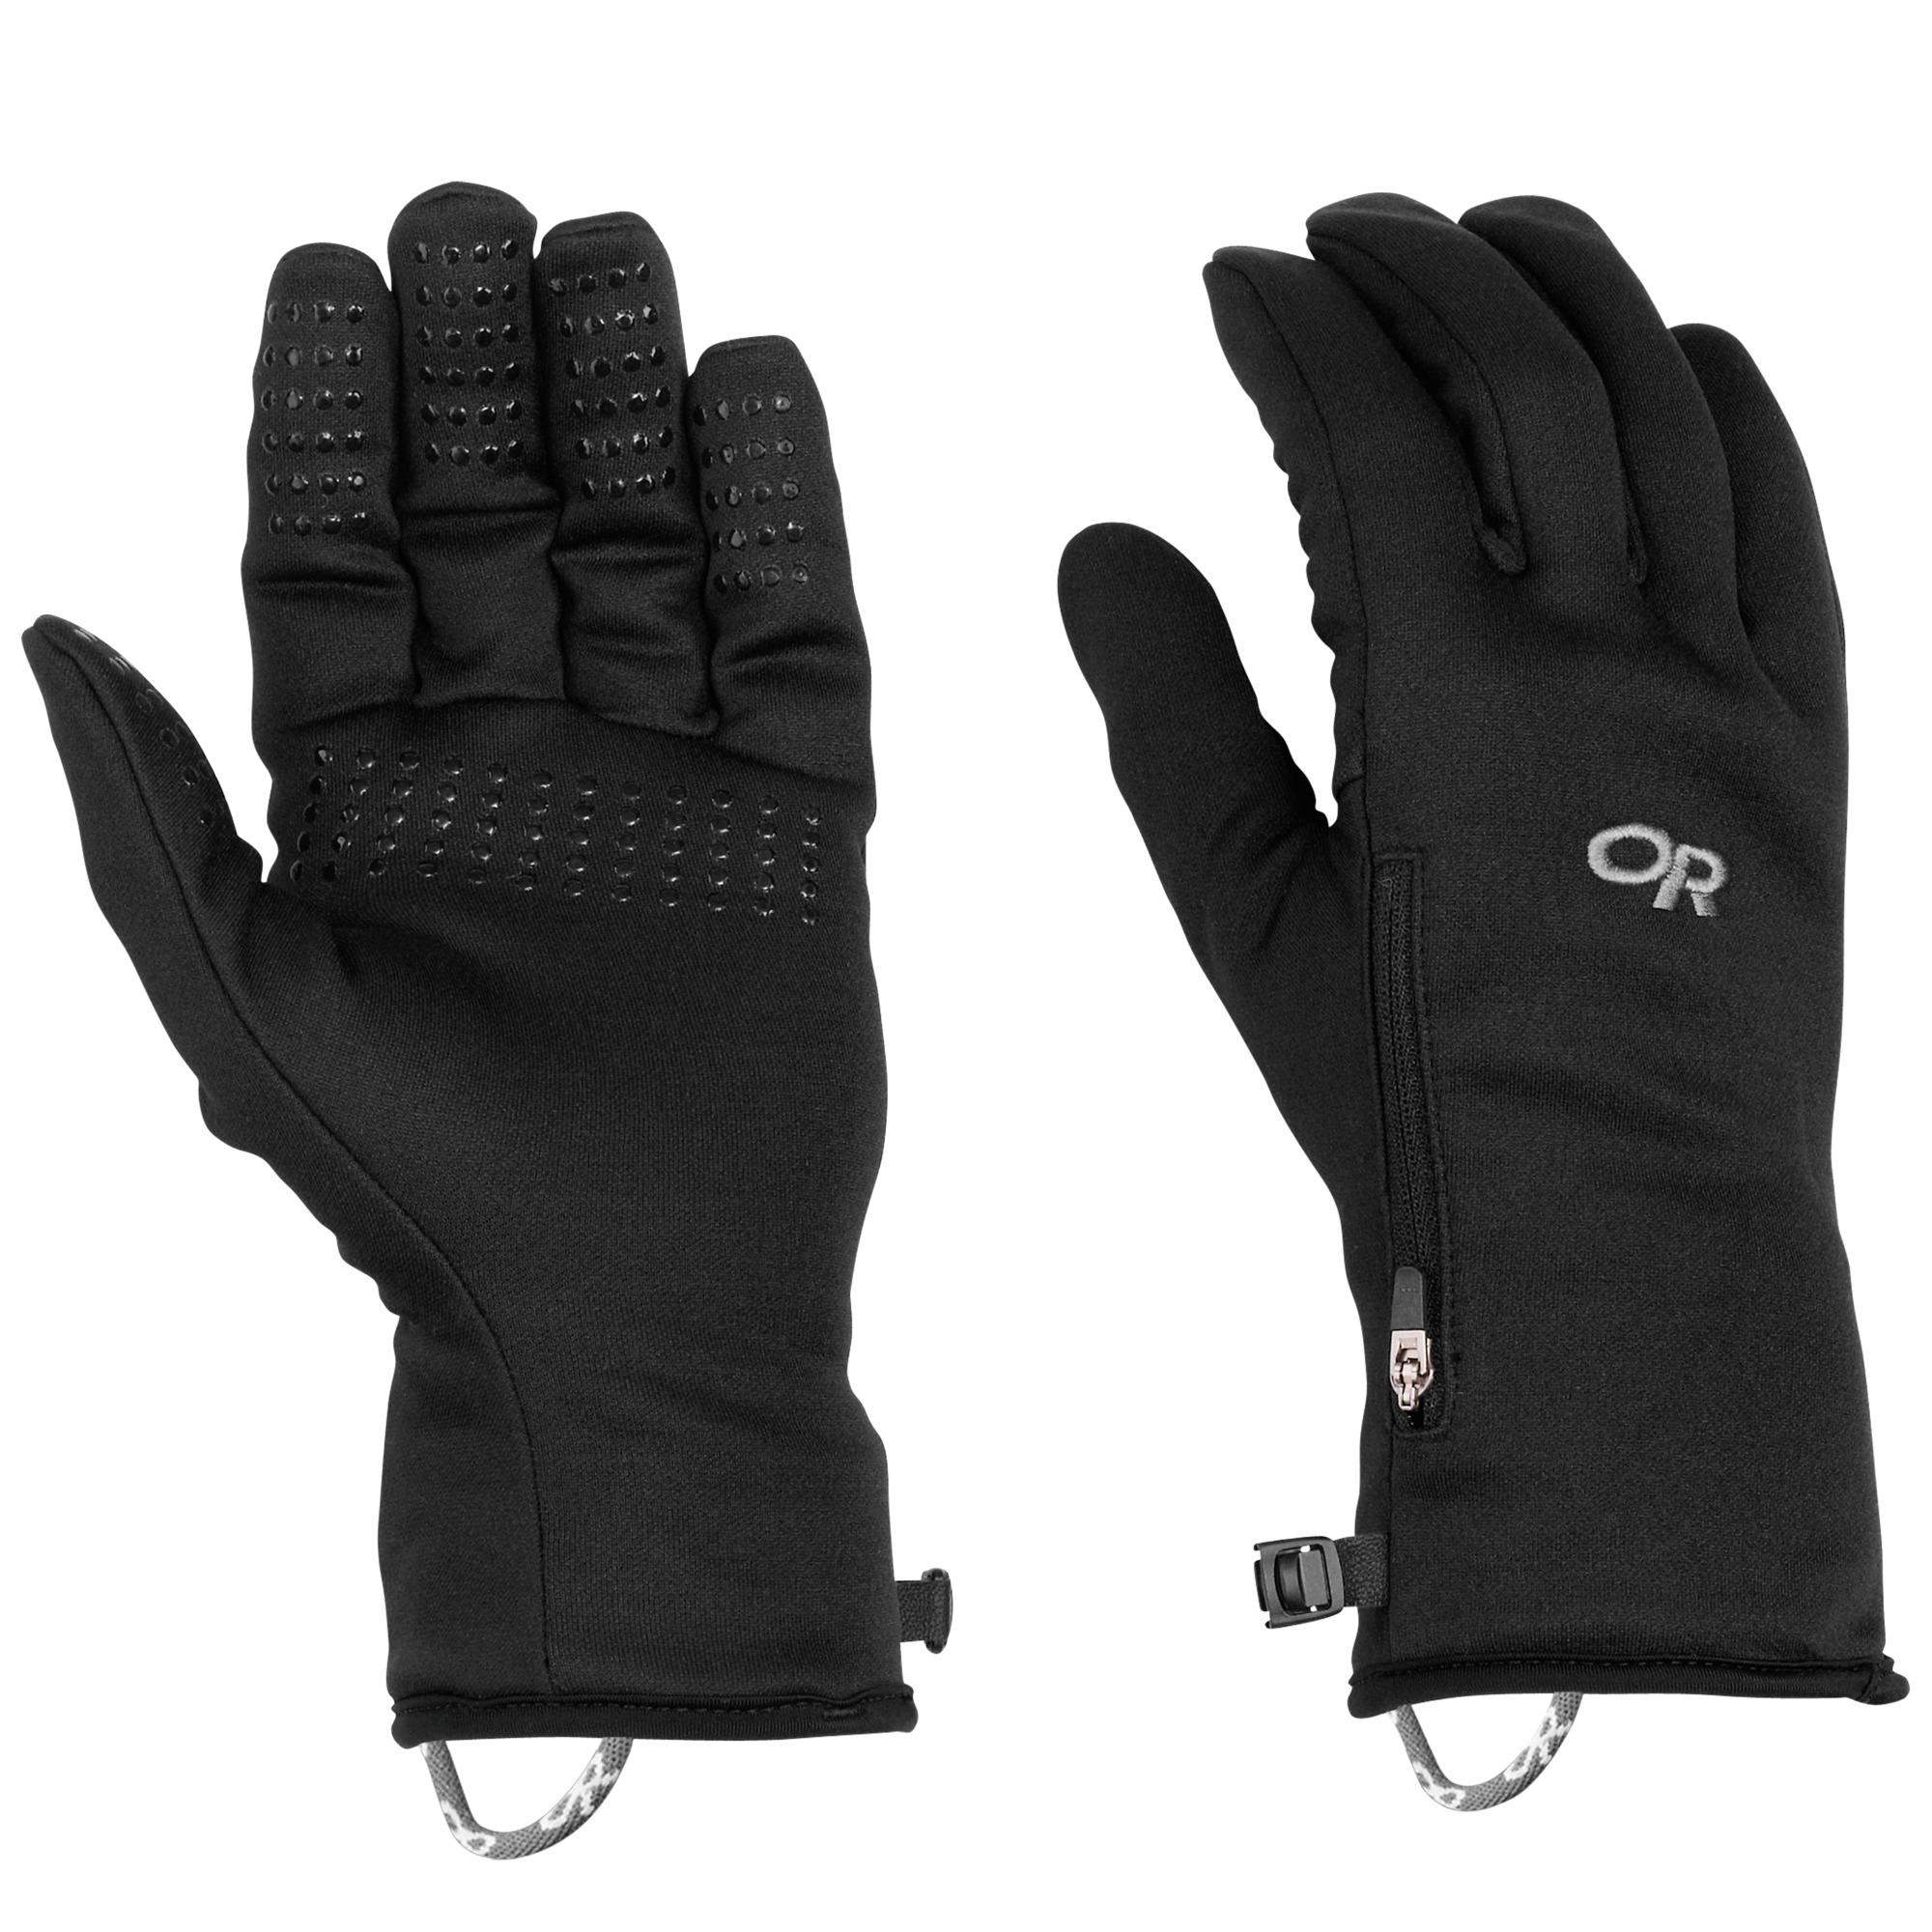 Outdoor Research Men's Versaliner Gloves-black-L - Gr. L